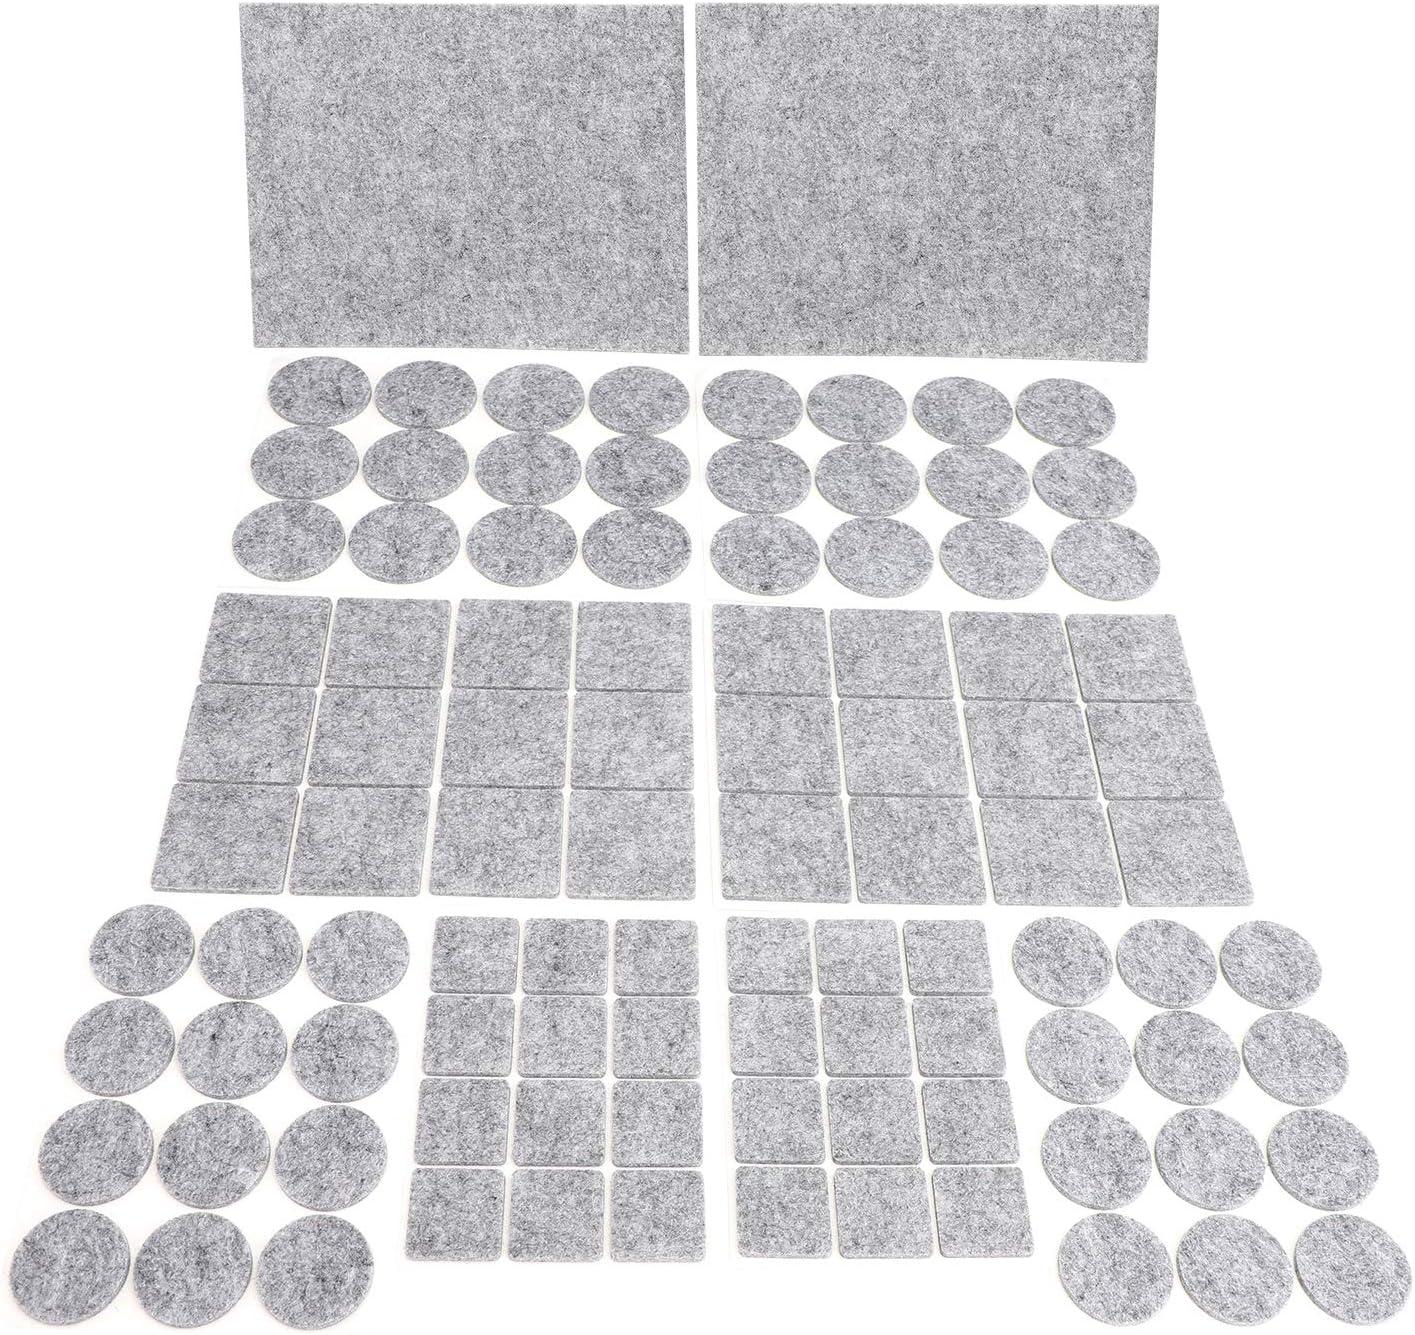 JYPS Furniture Pads Cash special price Self Adhesive High Sc Density Anti Felt Pad trend rank